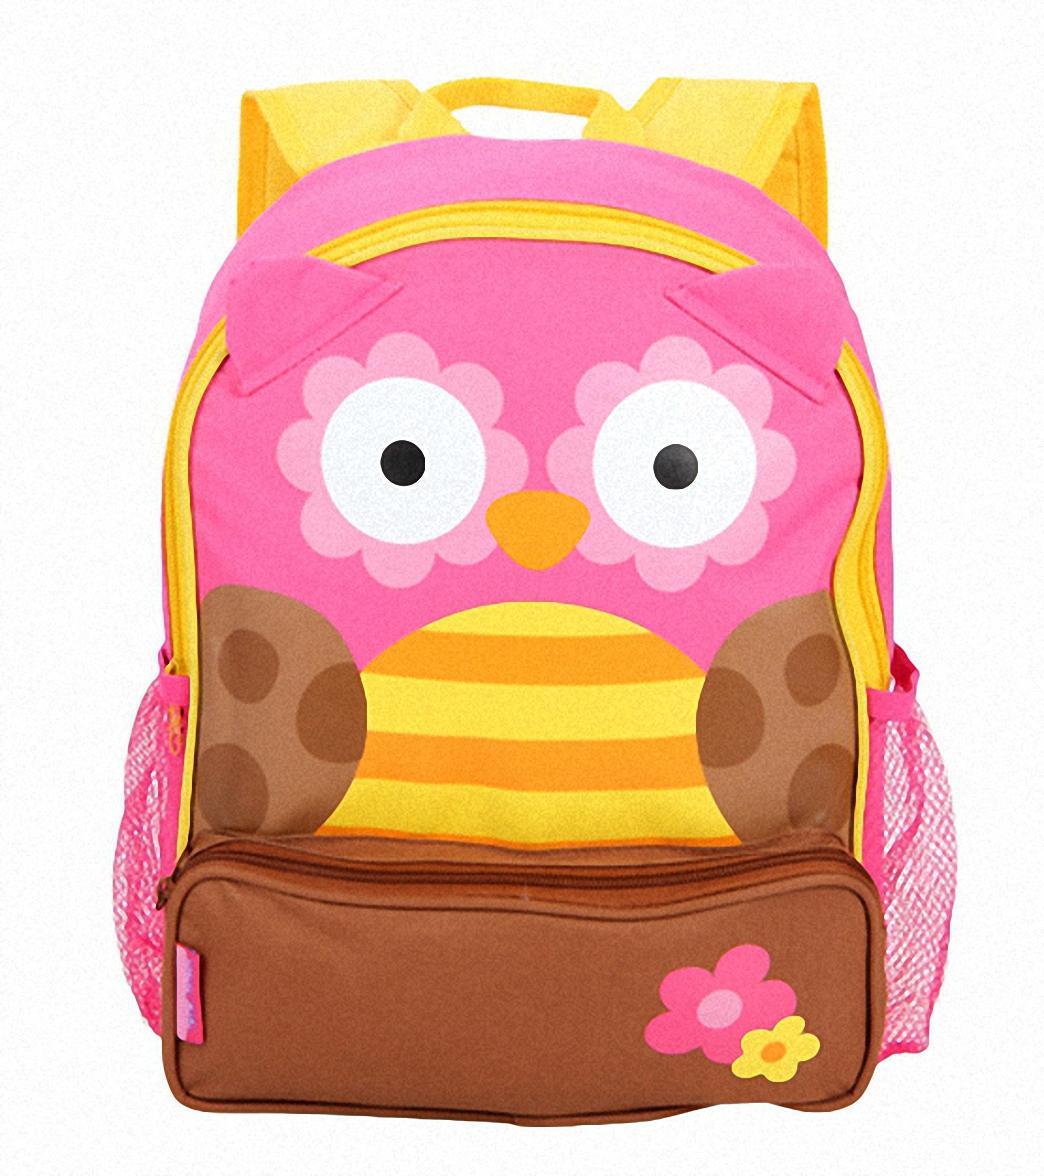 3961c1e36185 Stephen Joseph Kids  Owl Sidekick Backpack at SwimOutlet.com